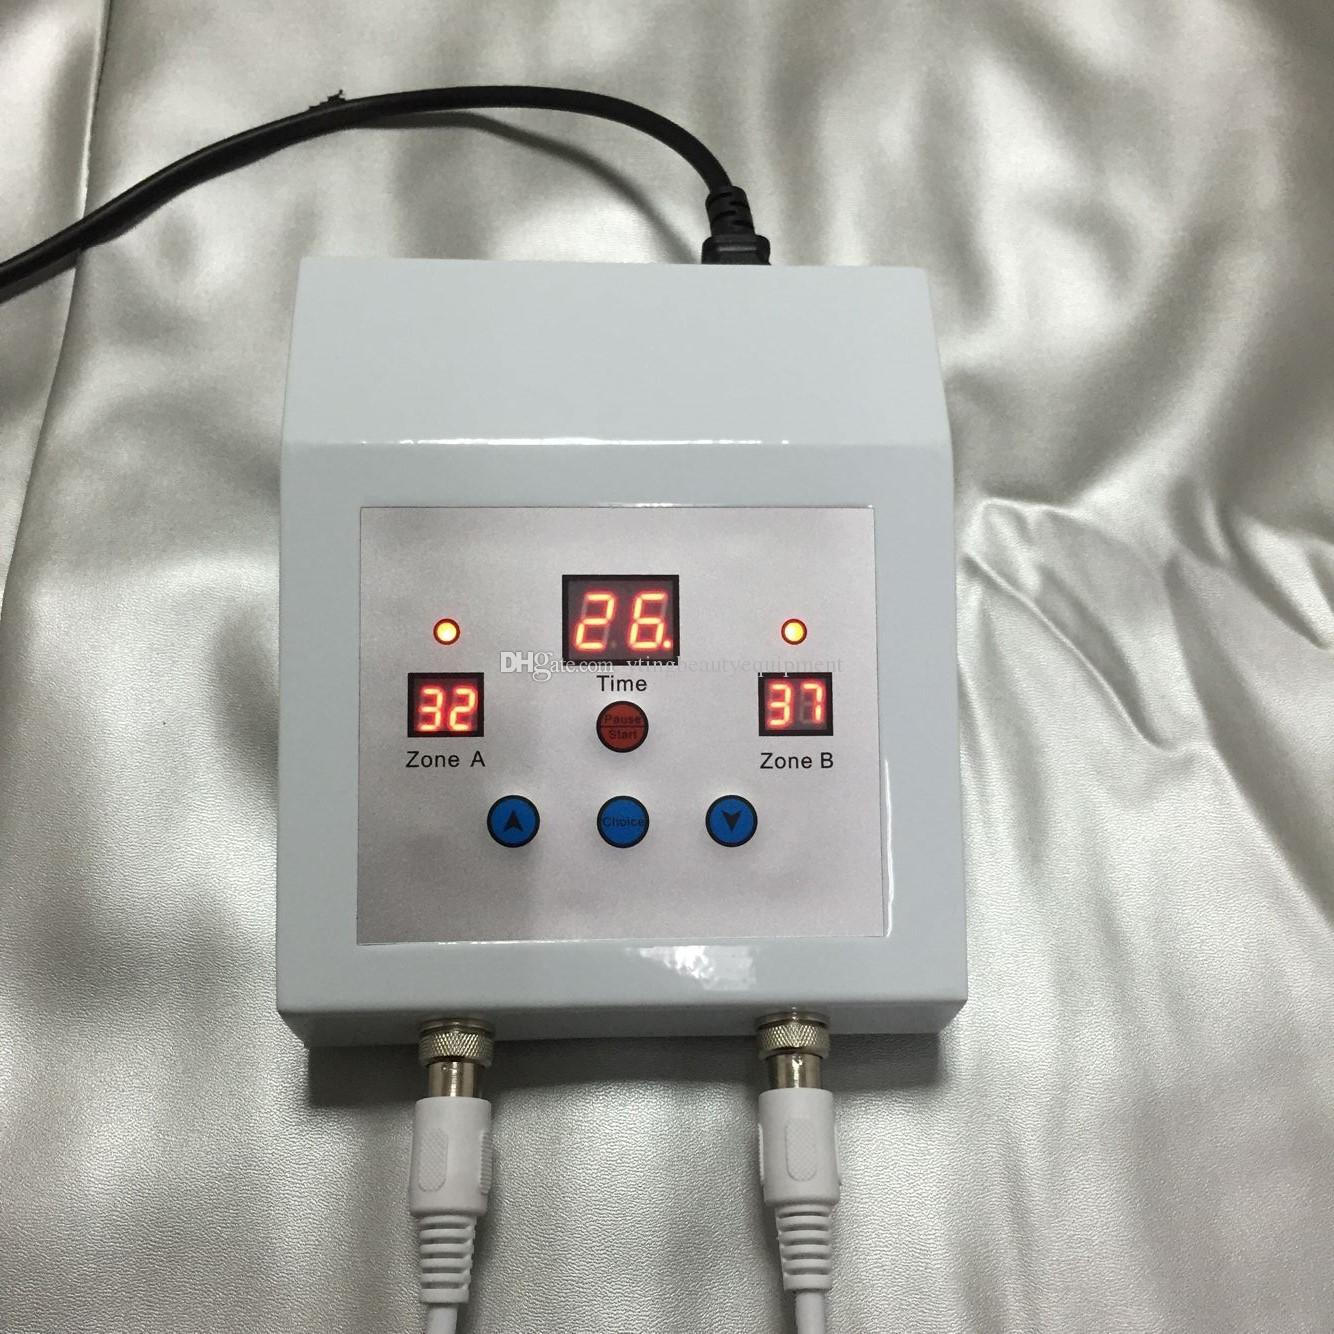 FIR-Infrarot-Sauna-Decken-Gewichtsverlust-Körper, der Decken-Infrarotstrahl-Hitze abnimmt